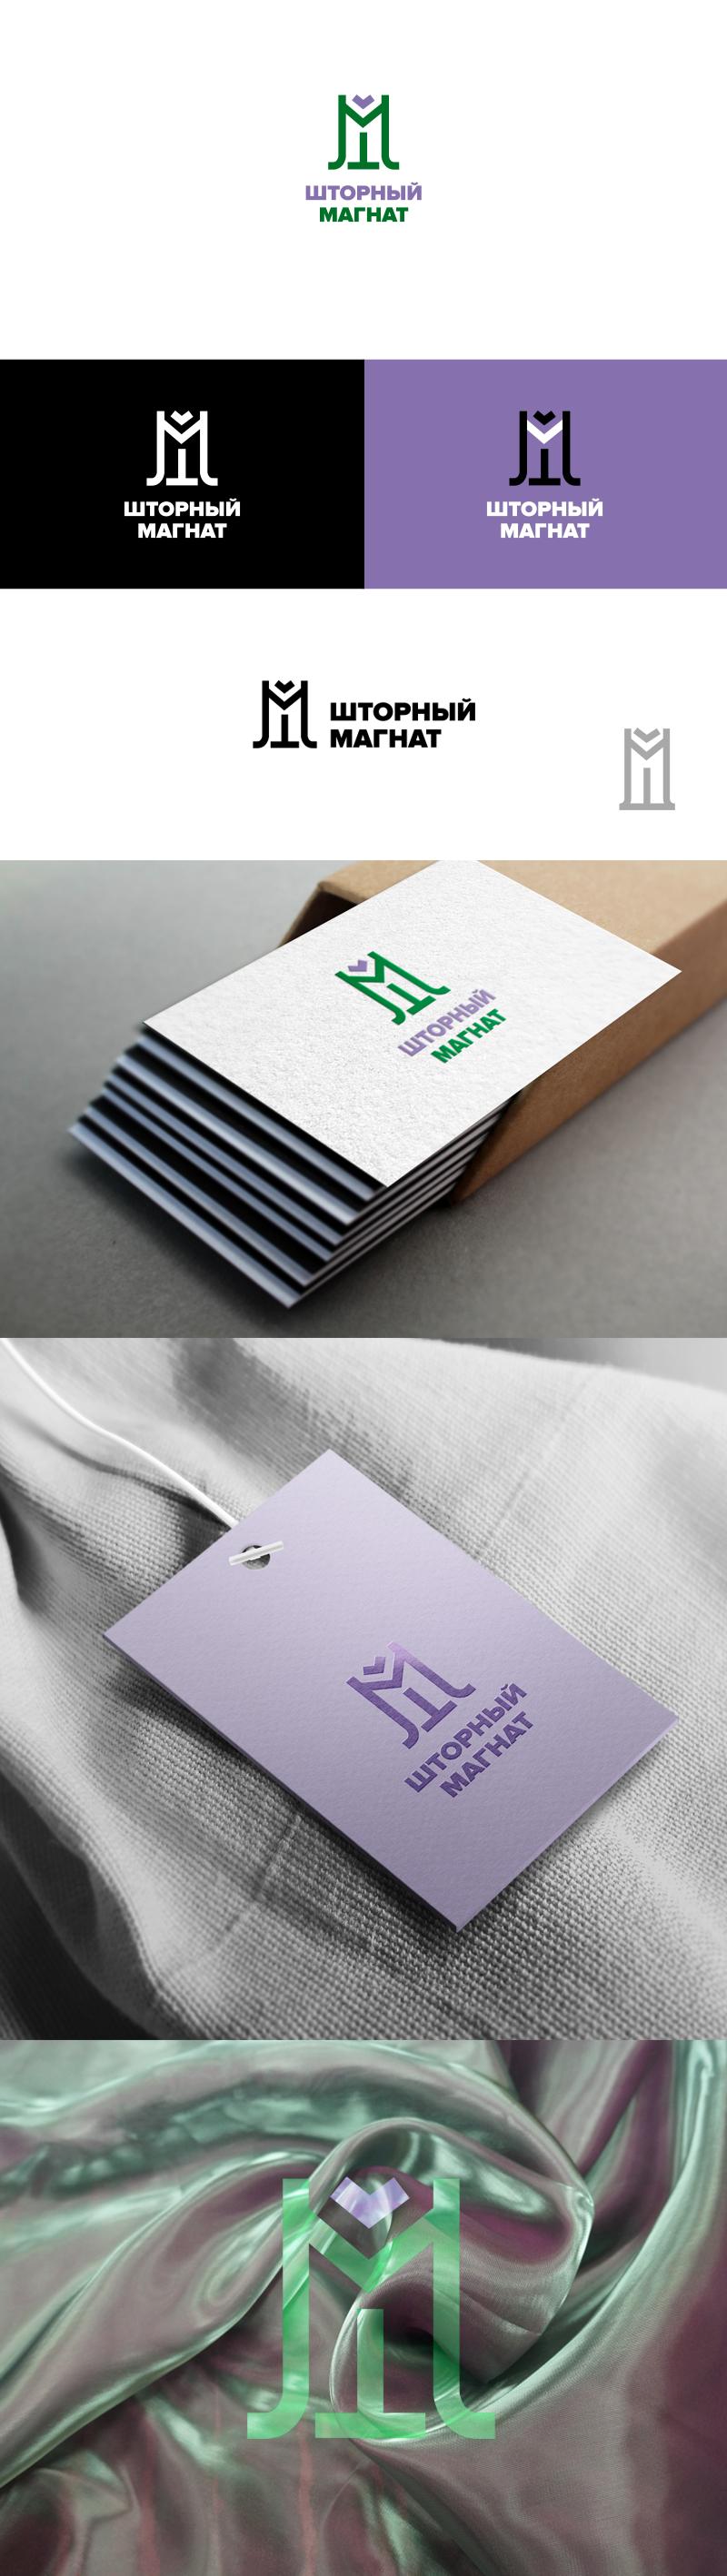 Логотип и фирменный стиль для магазина тканей. фото f_6025cd92f6077705.jpg